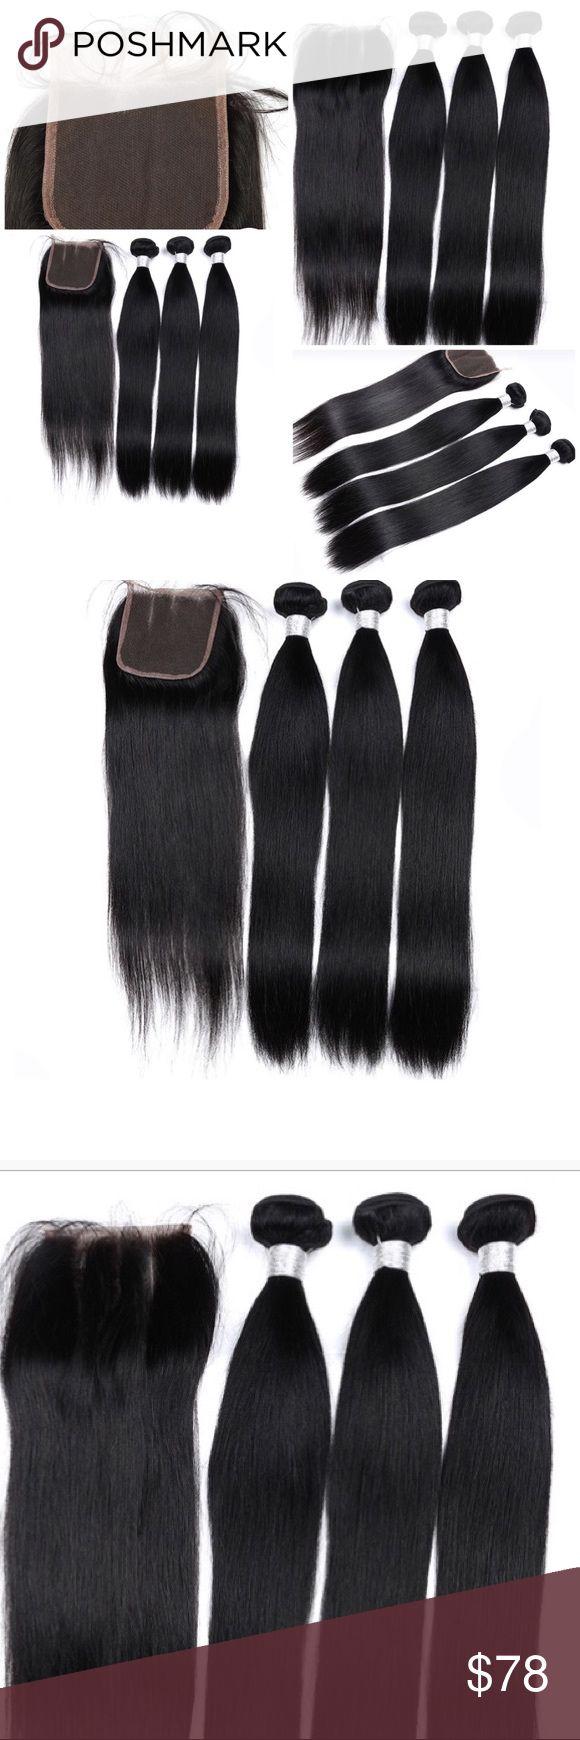 Straight perm yahoo answers - The 25 Best Straight Hair Perm Ideas On Pinterest Beach Waves Tutorial Beach Hair Tutorials And Blonde Hair Colour Code